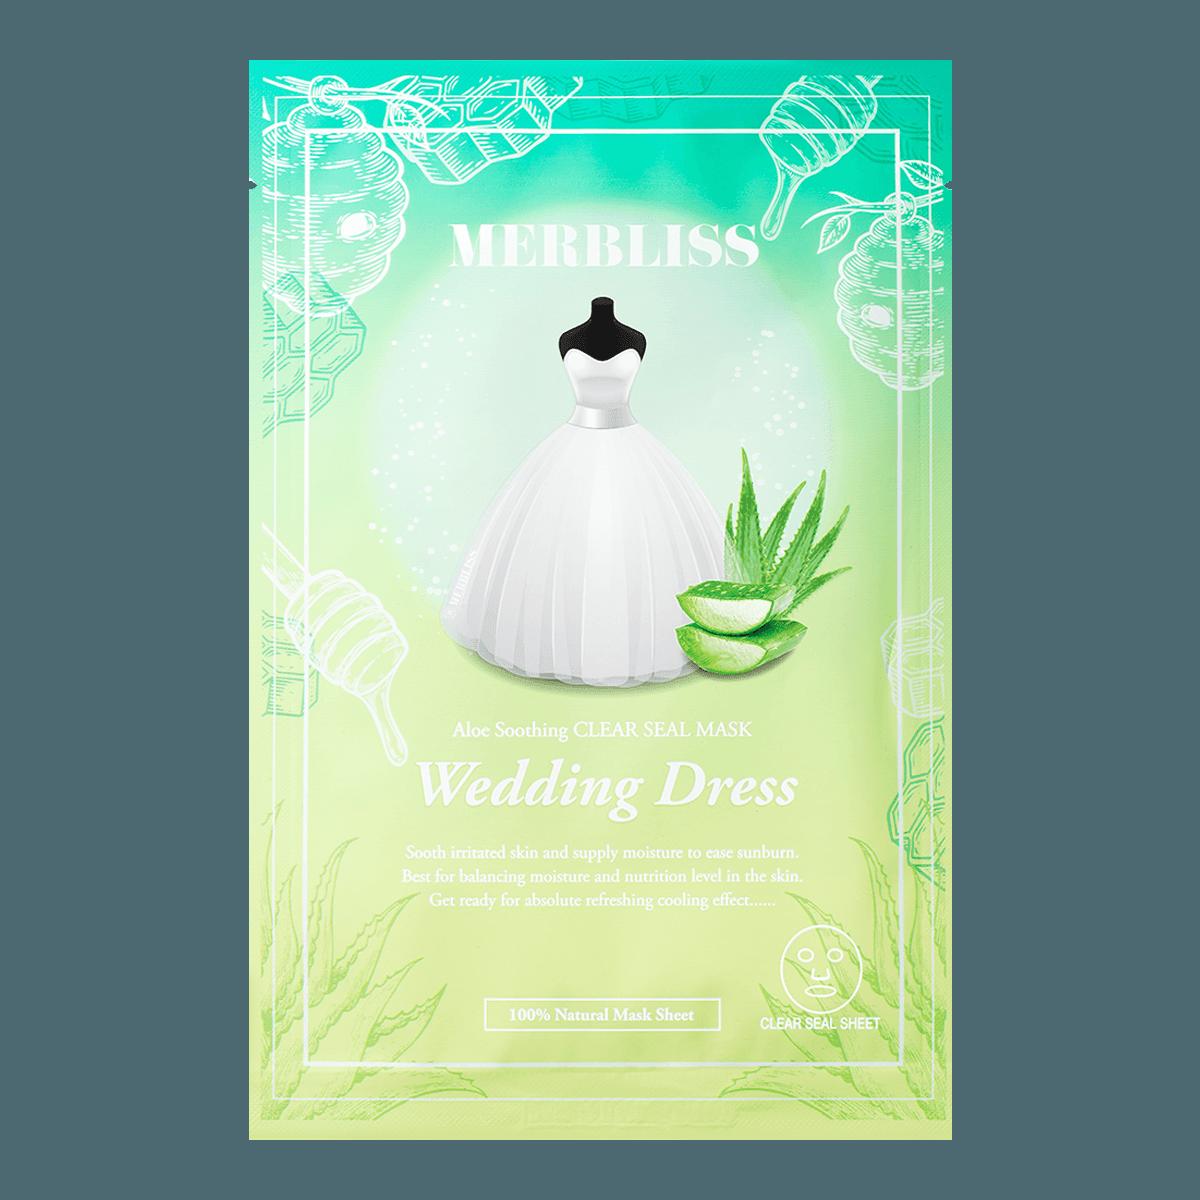 MERBLISS Wedding Dress Aloe Soothing Clear Seal Mask 1 Sheet